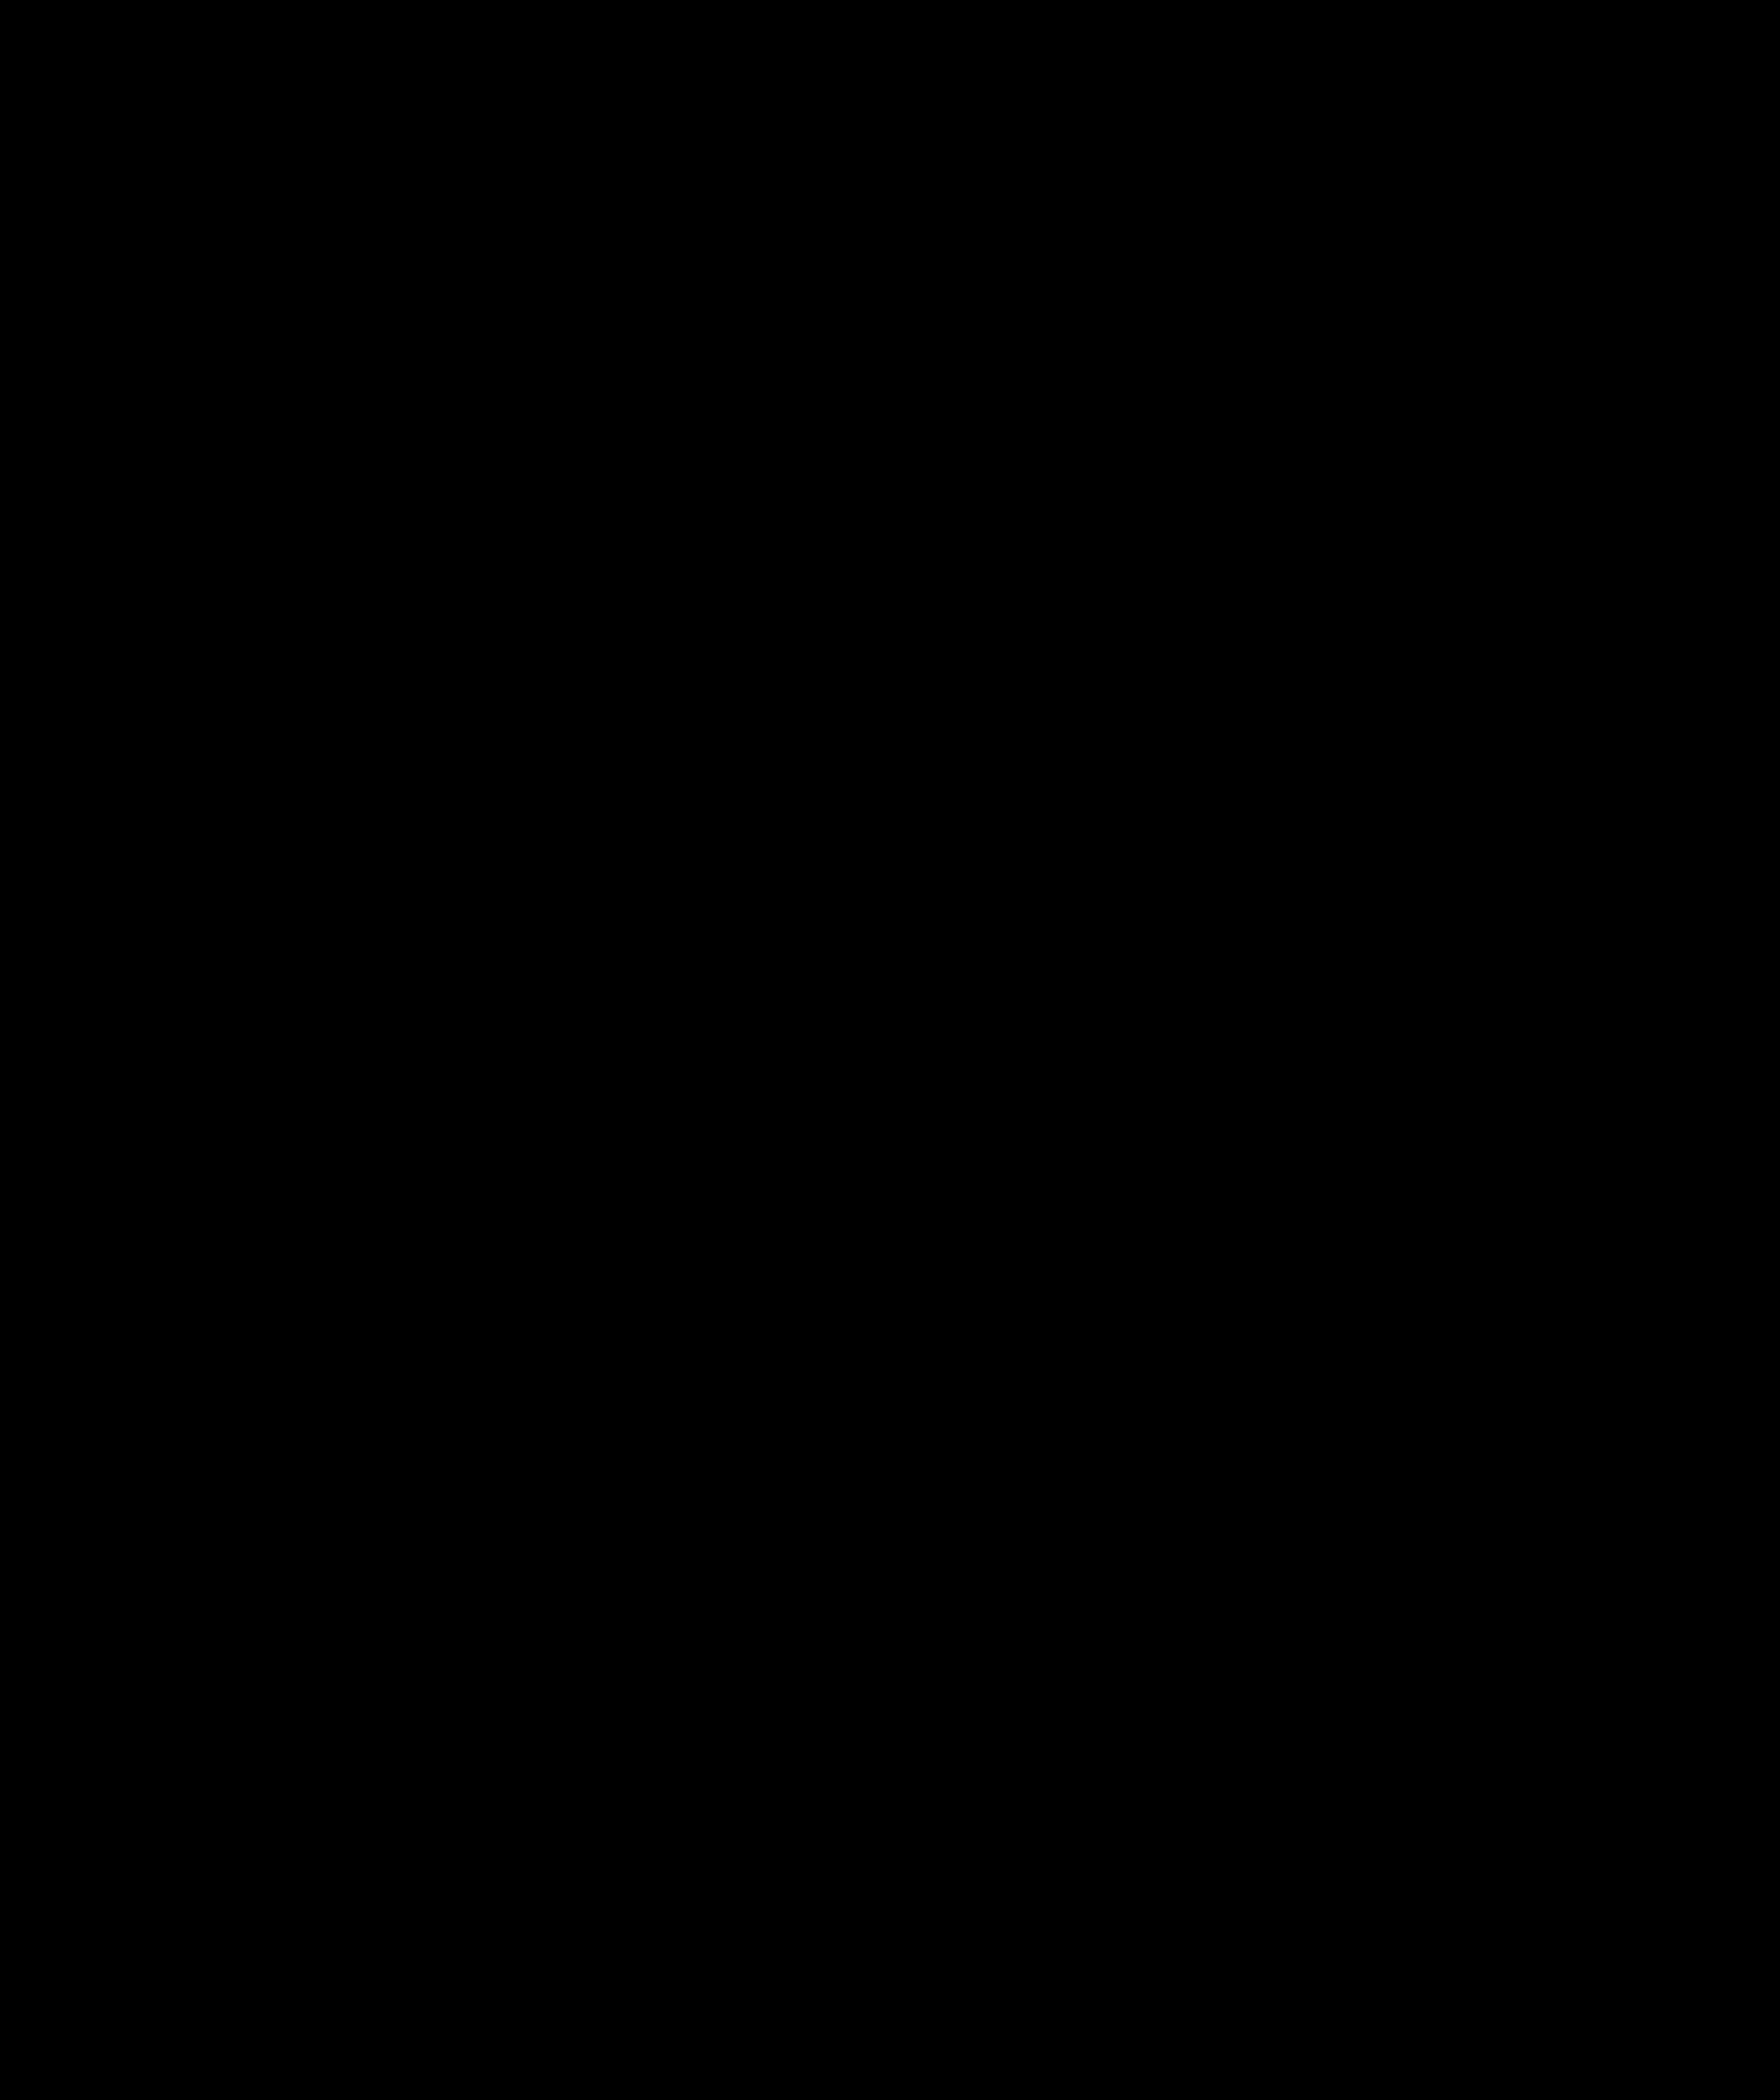 Nursing Symbol Clip Art-Nursing Symbol Clip Art-14